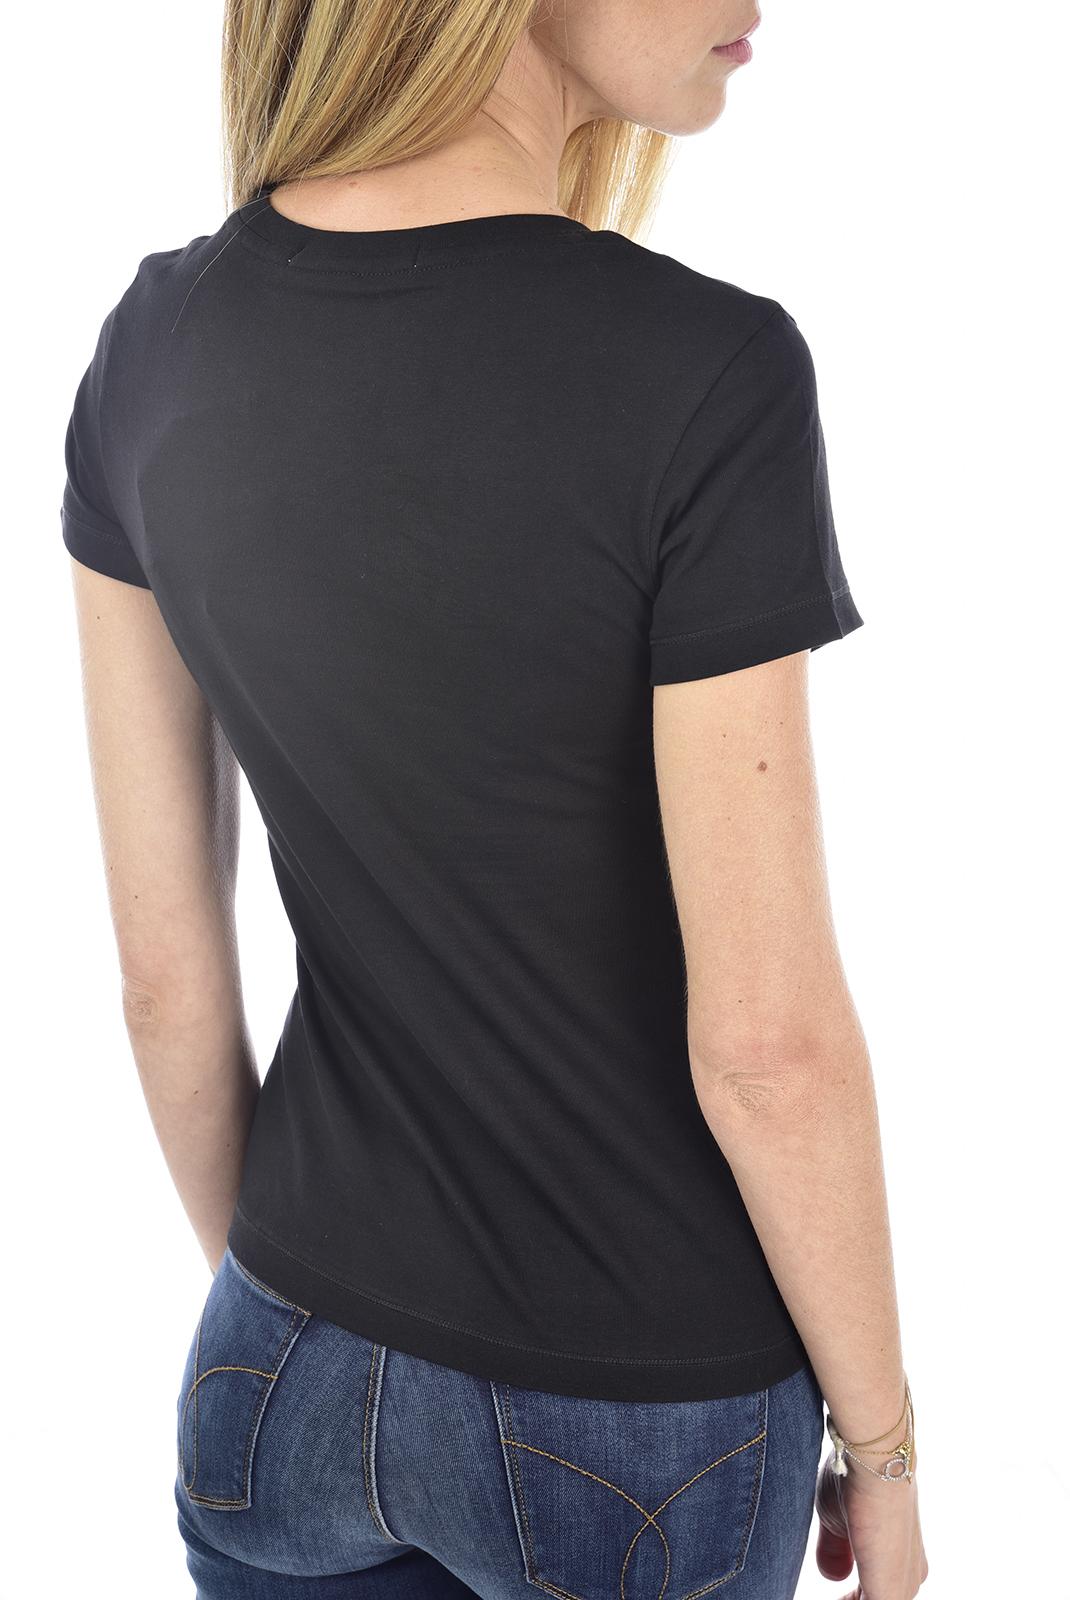 Tee shirt  Calvin klein J20J212883 BAE CK BLACK